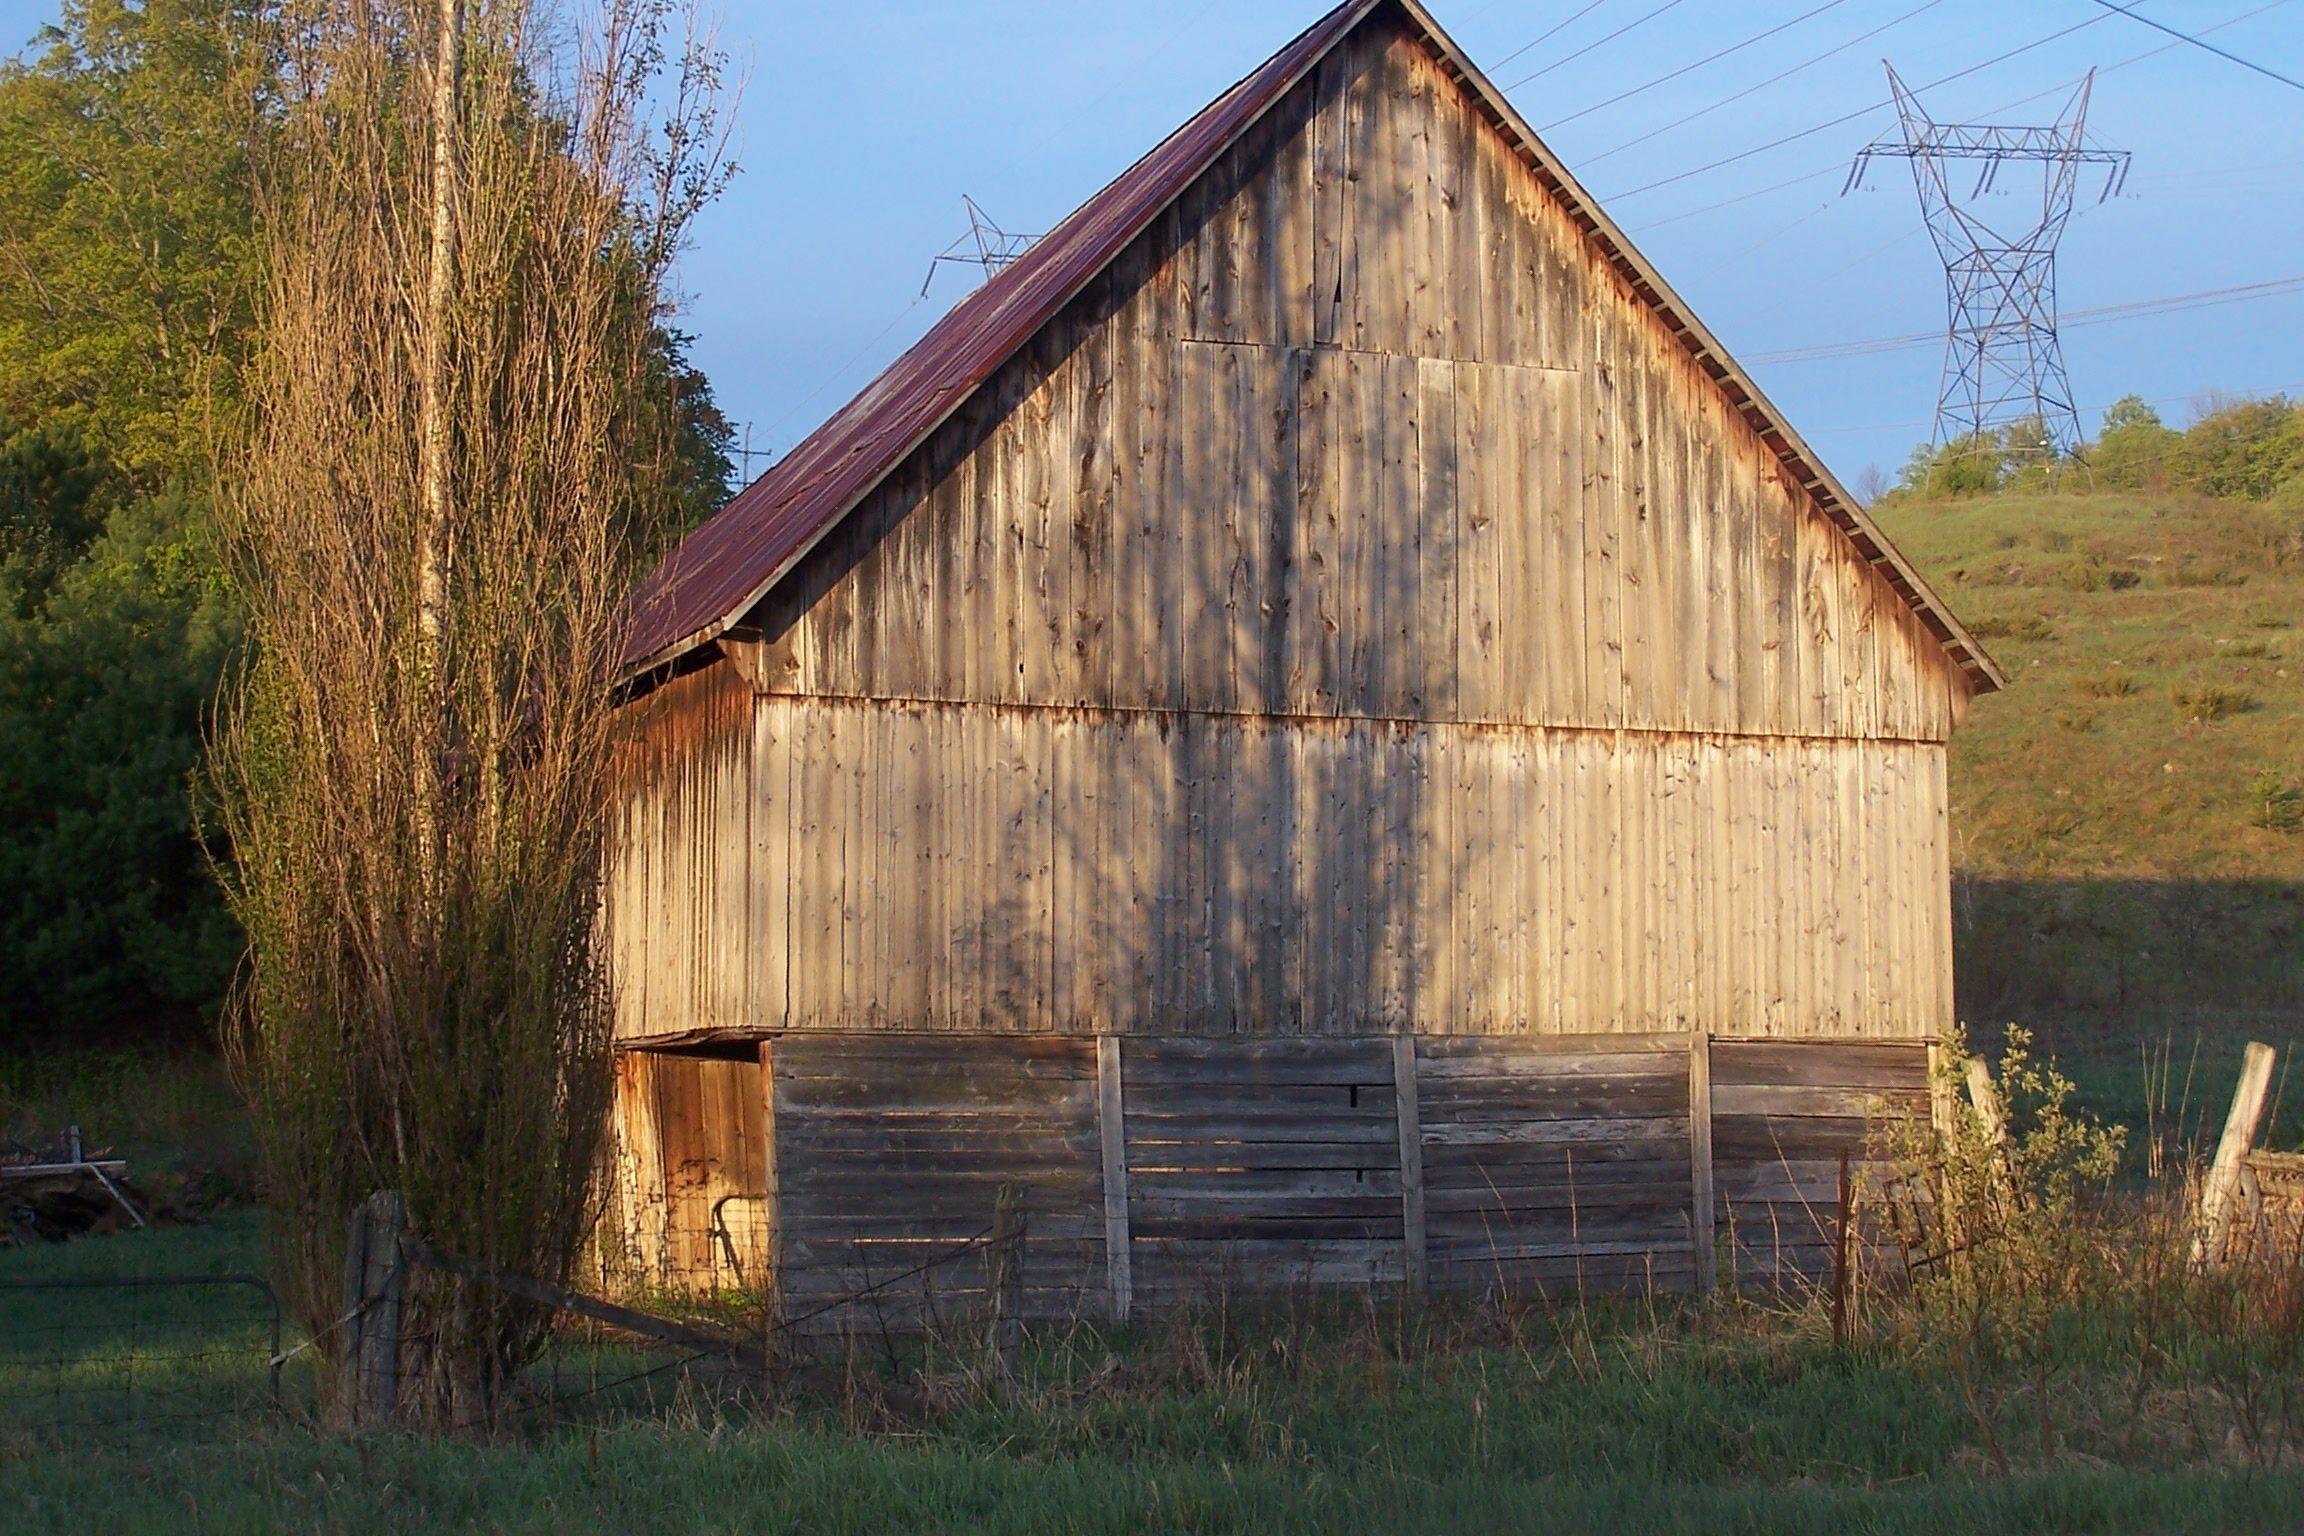 Taken along Eagle Lake Road in Haliburton County